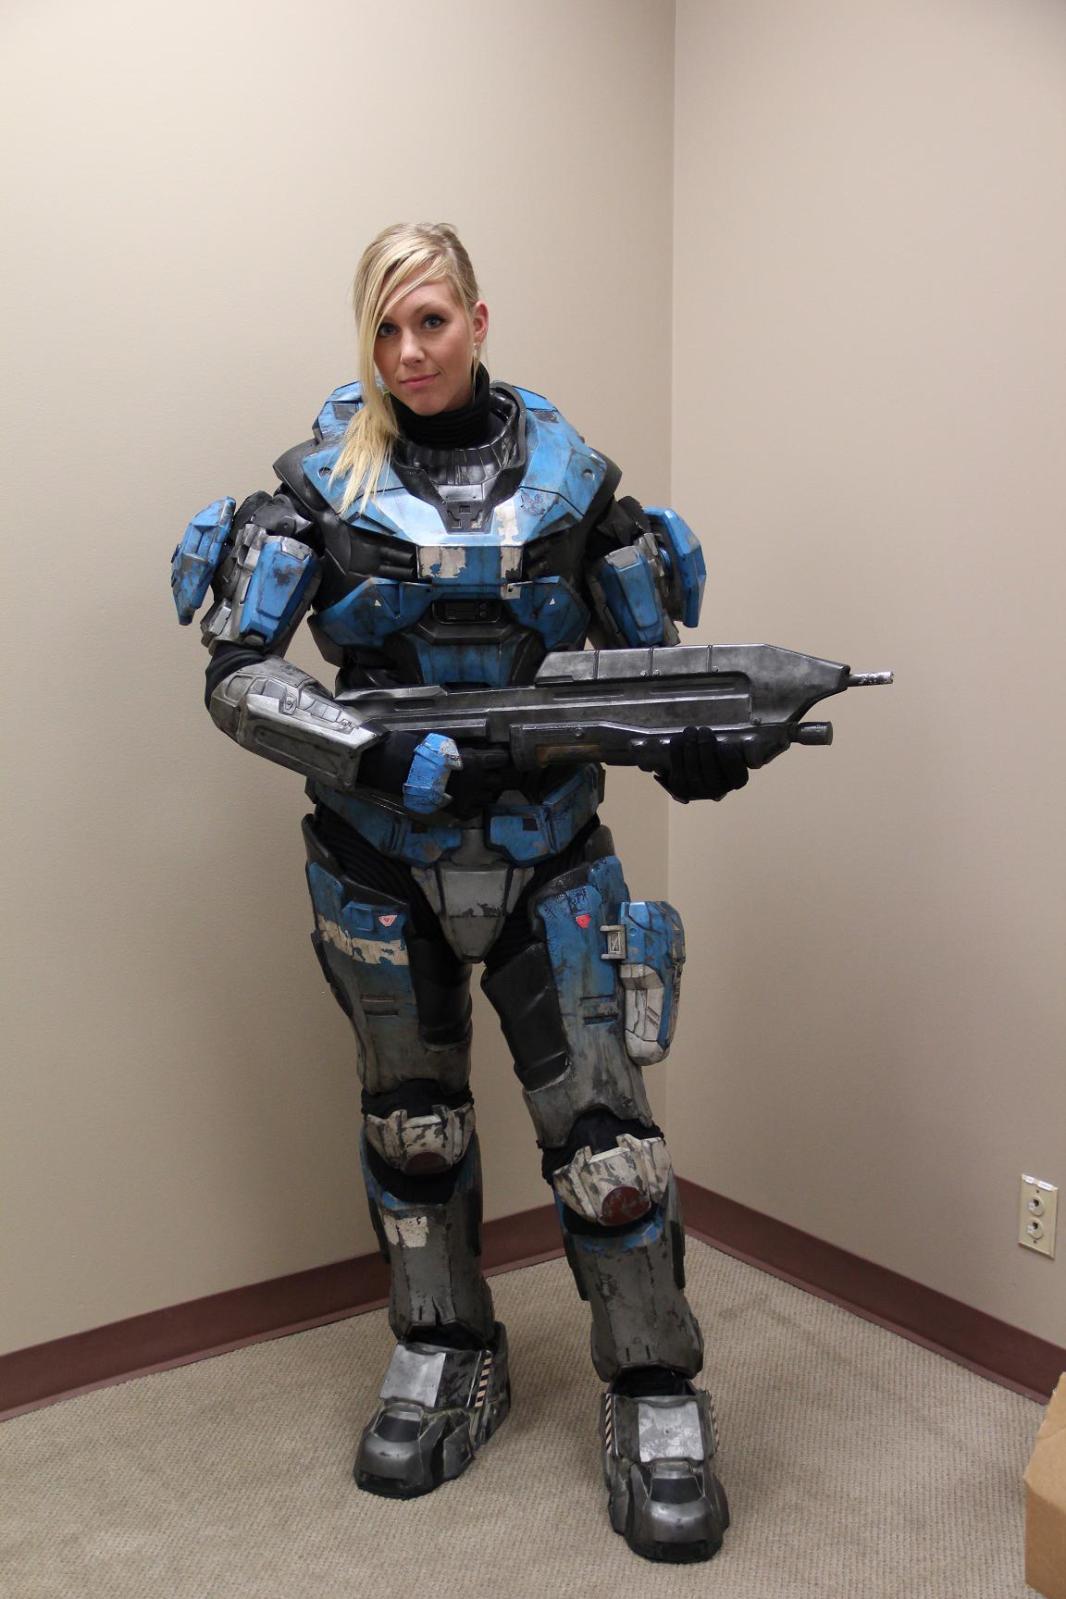 Halo spartan cosplay girl